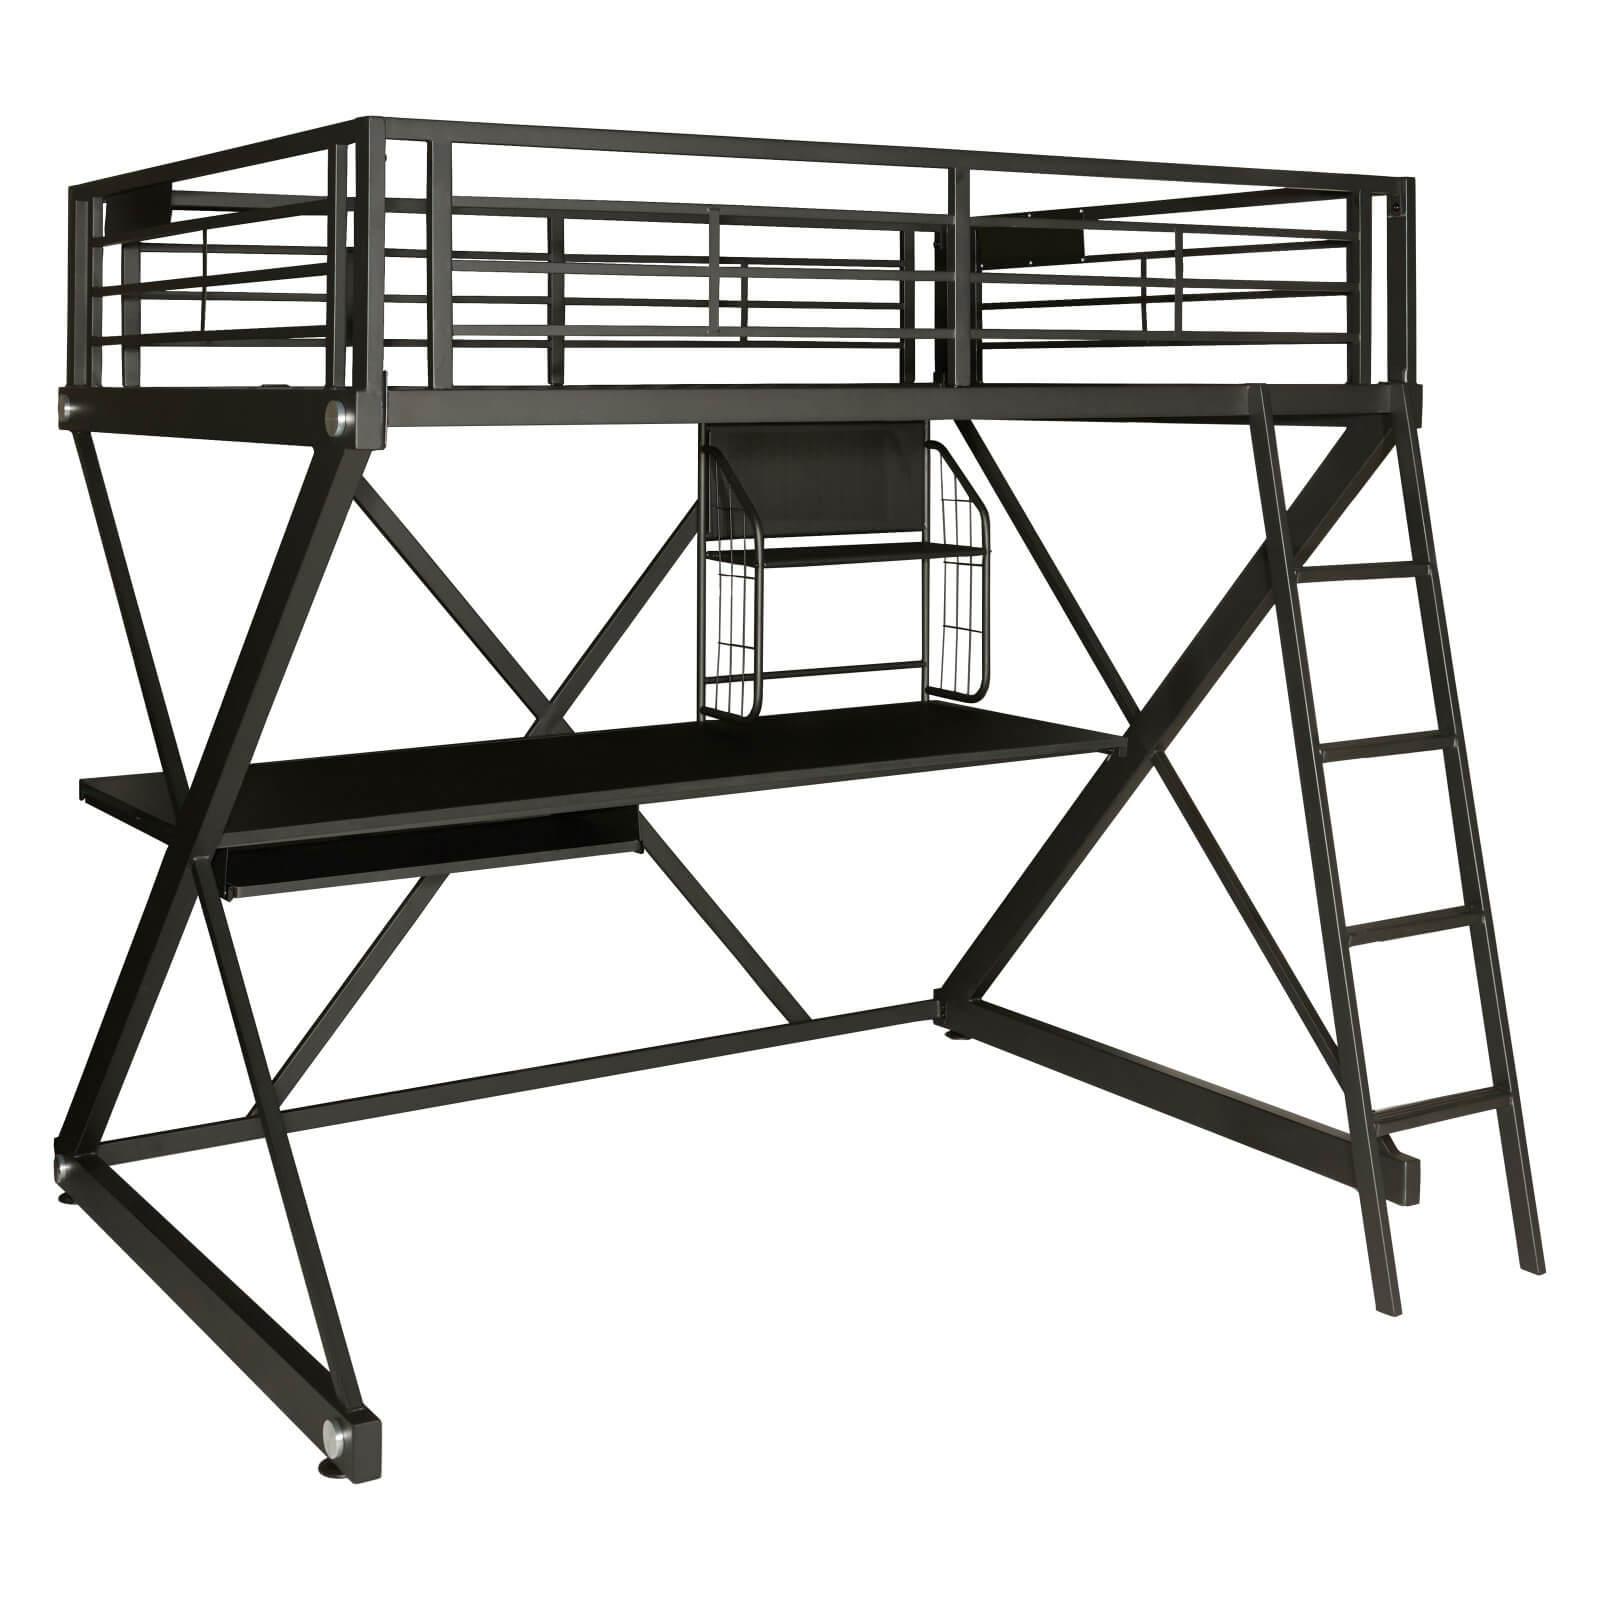 1600x1600 Z Bedroom Full Size Study Loft Bunk Bed Furnishings Warehouse